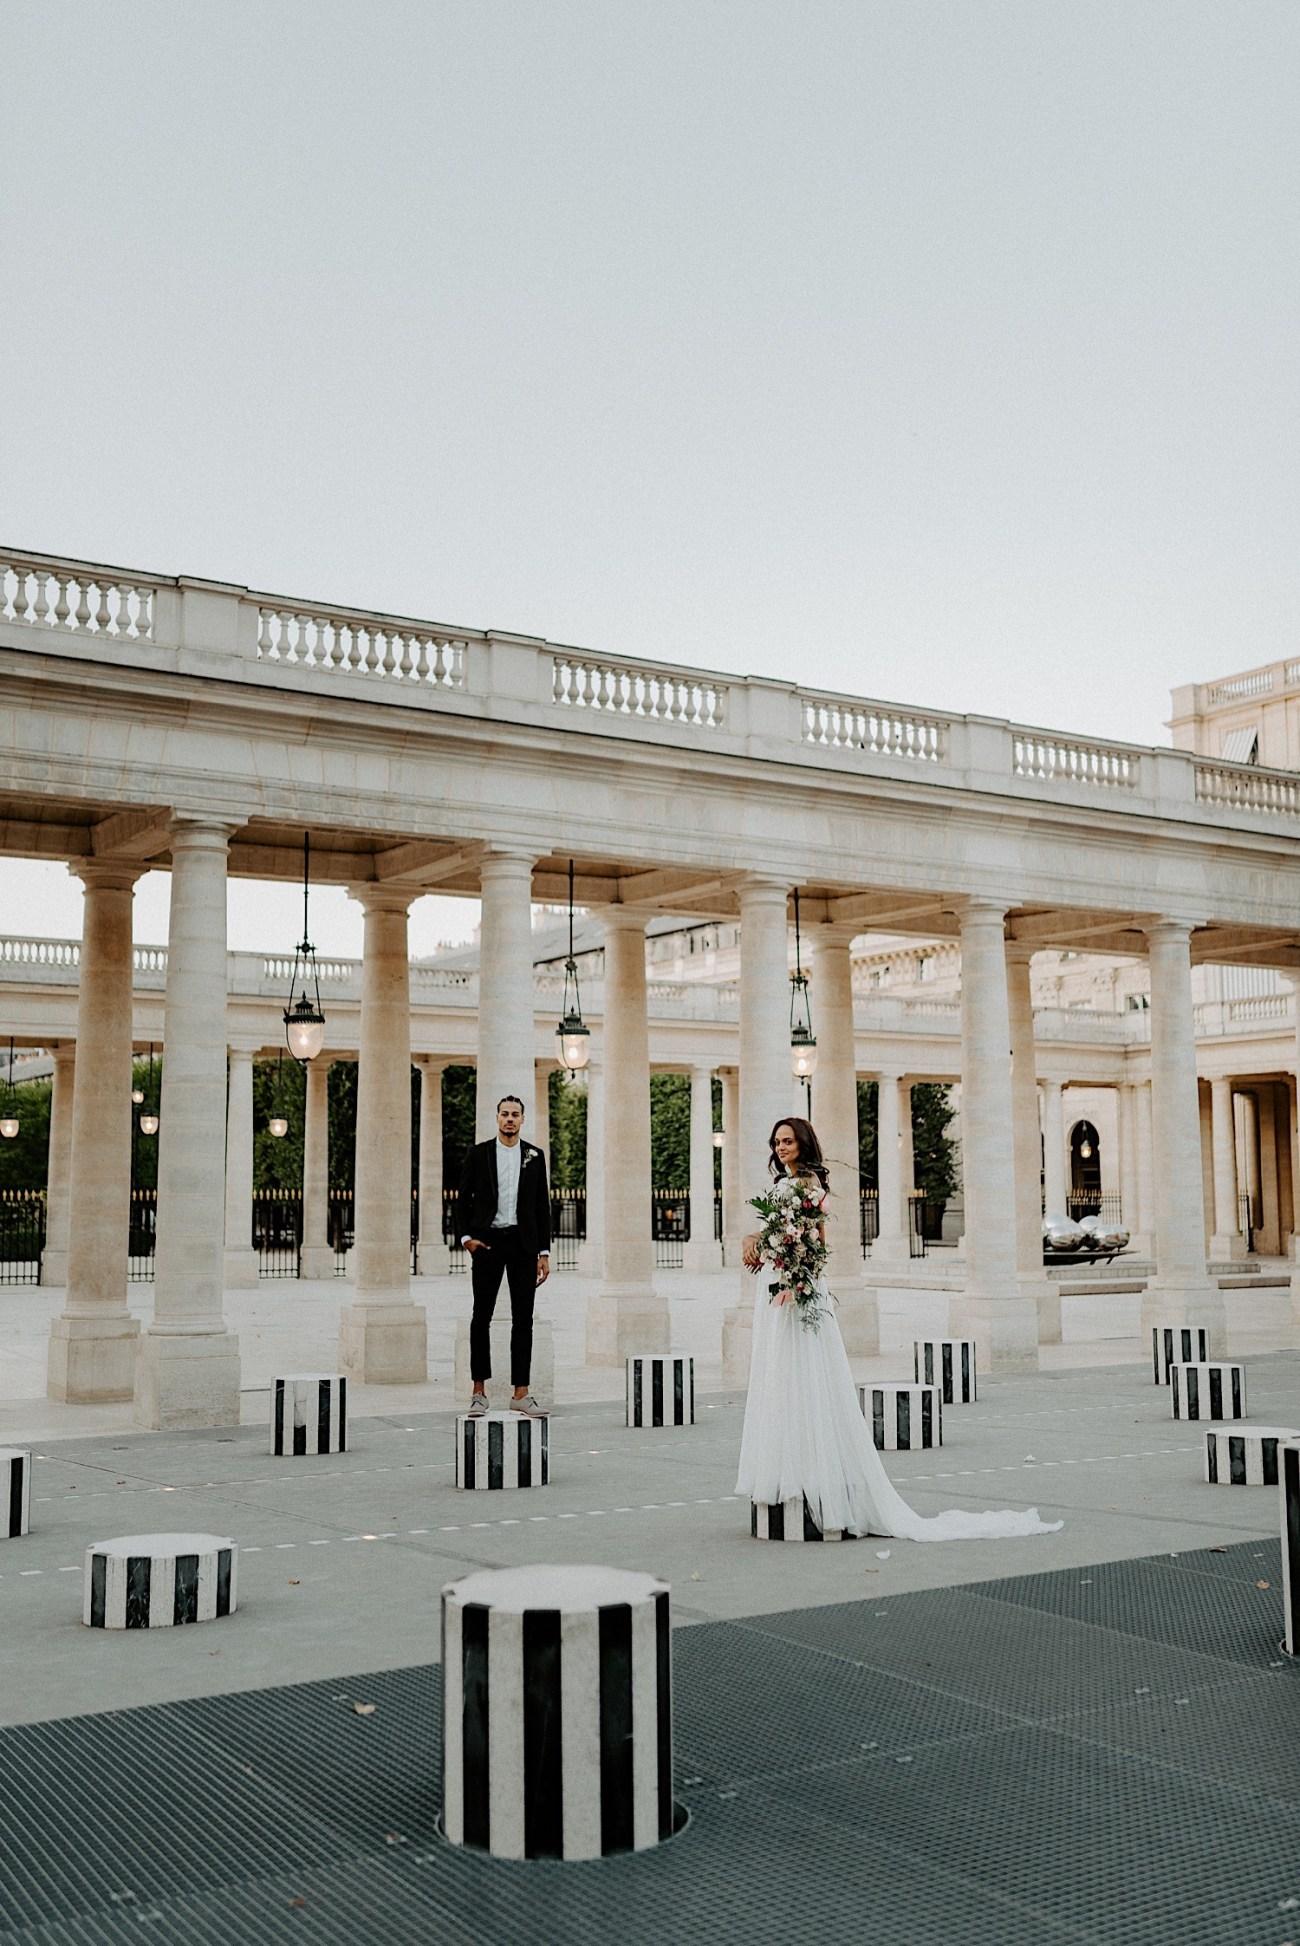 Paris Louvre Wedding Photos Paris Wedding Photographer Destination Wedding France Anais Possamai Photography 10